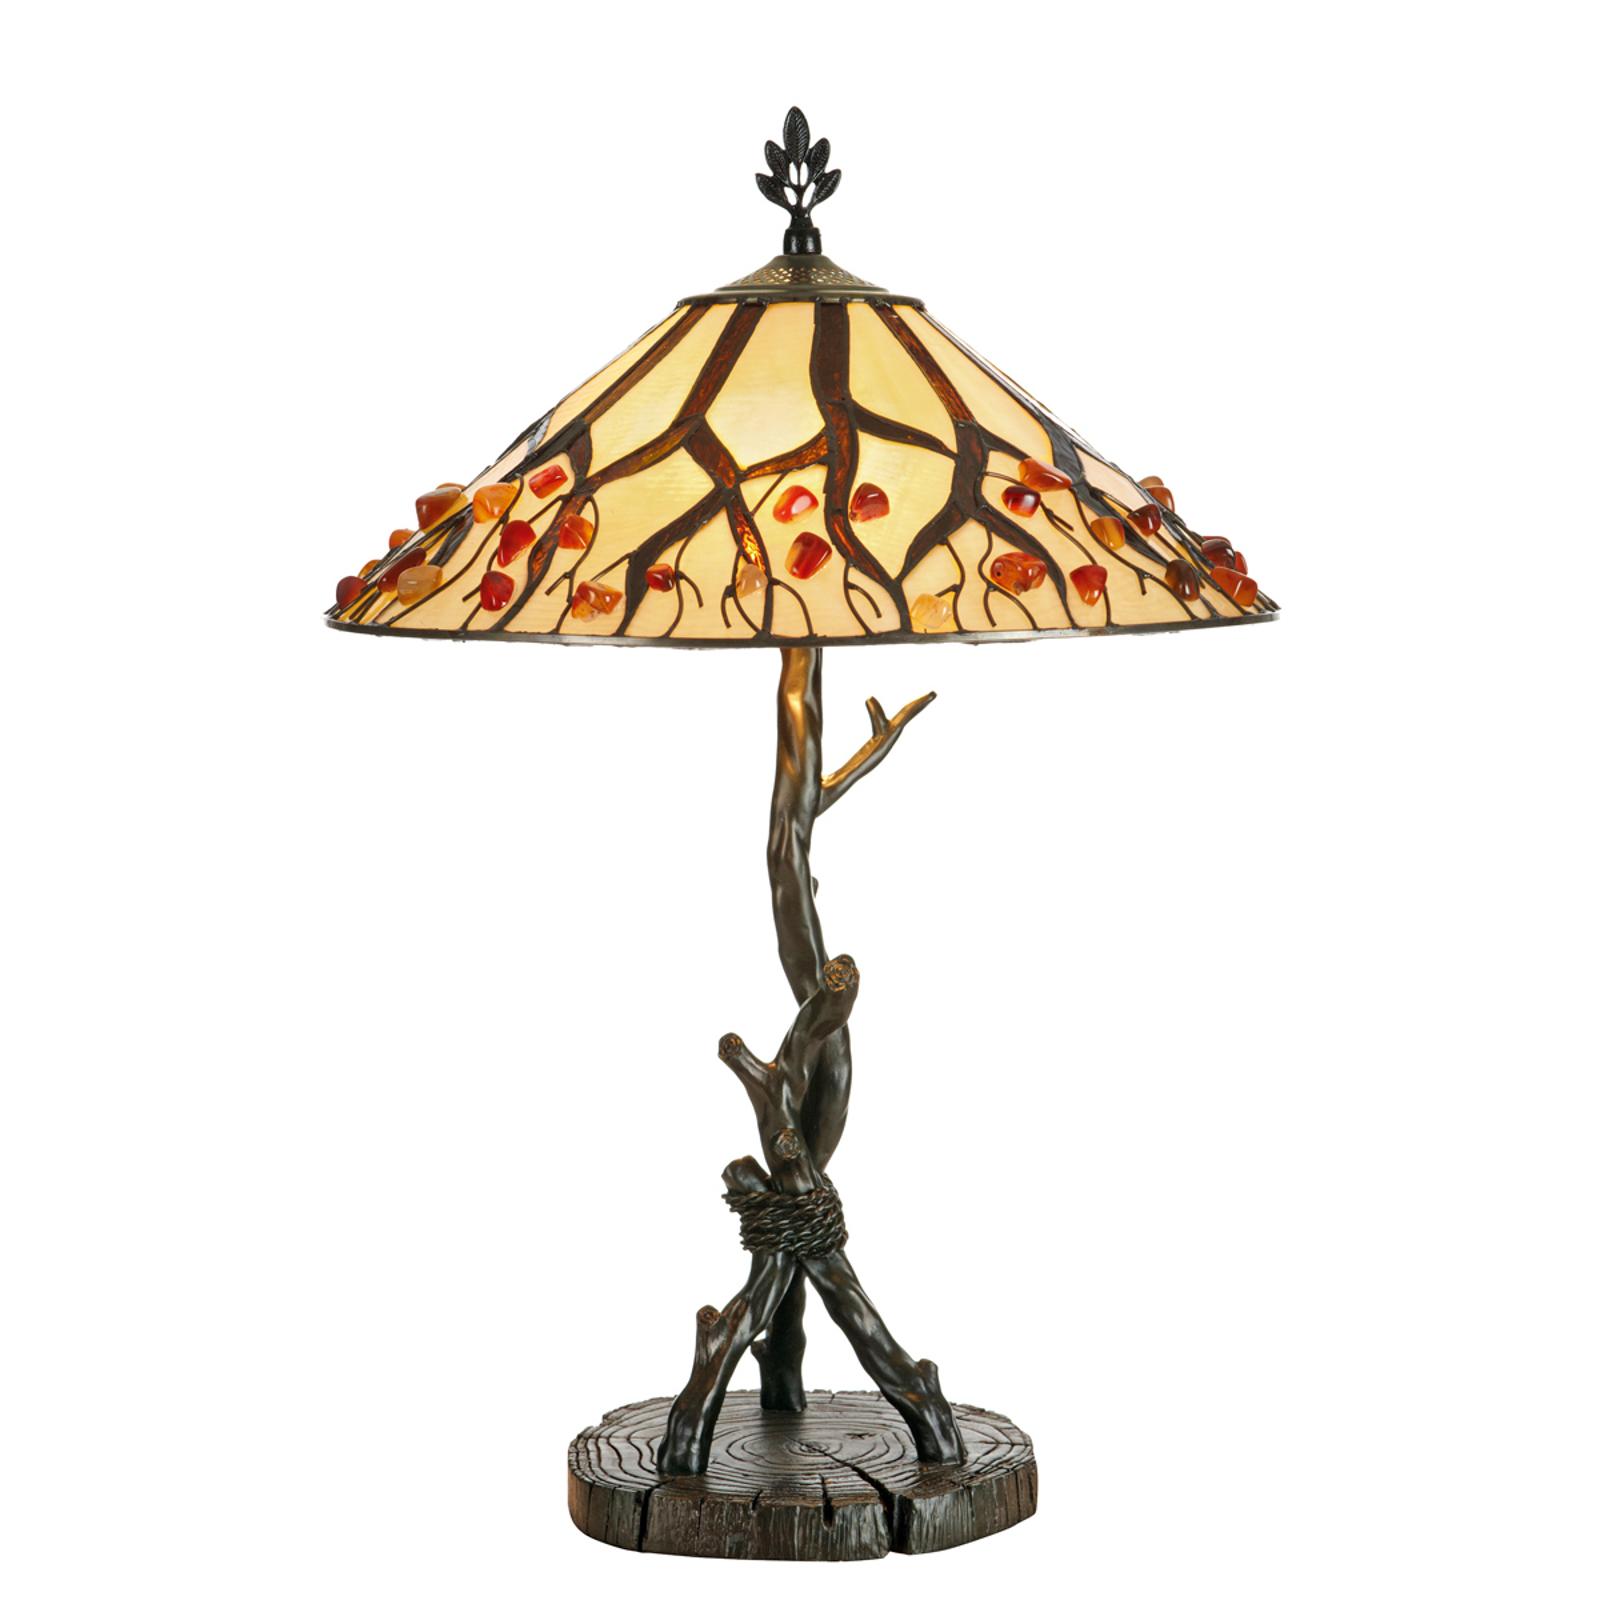 Extraordinary table lamp Jordis_1032345_1